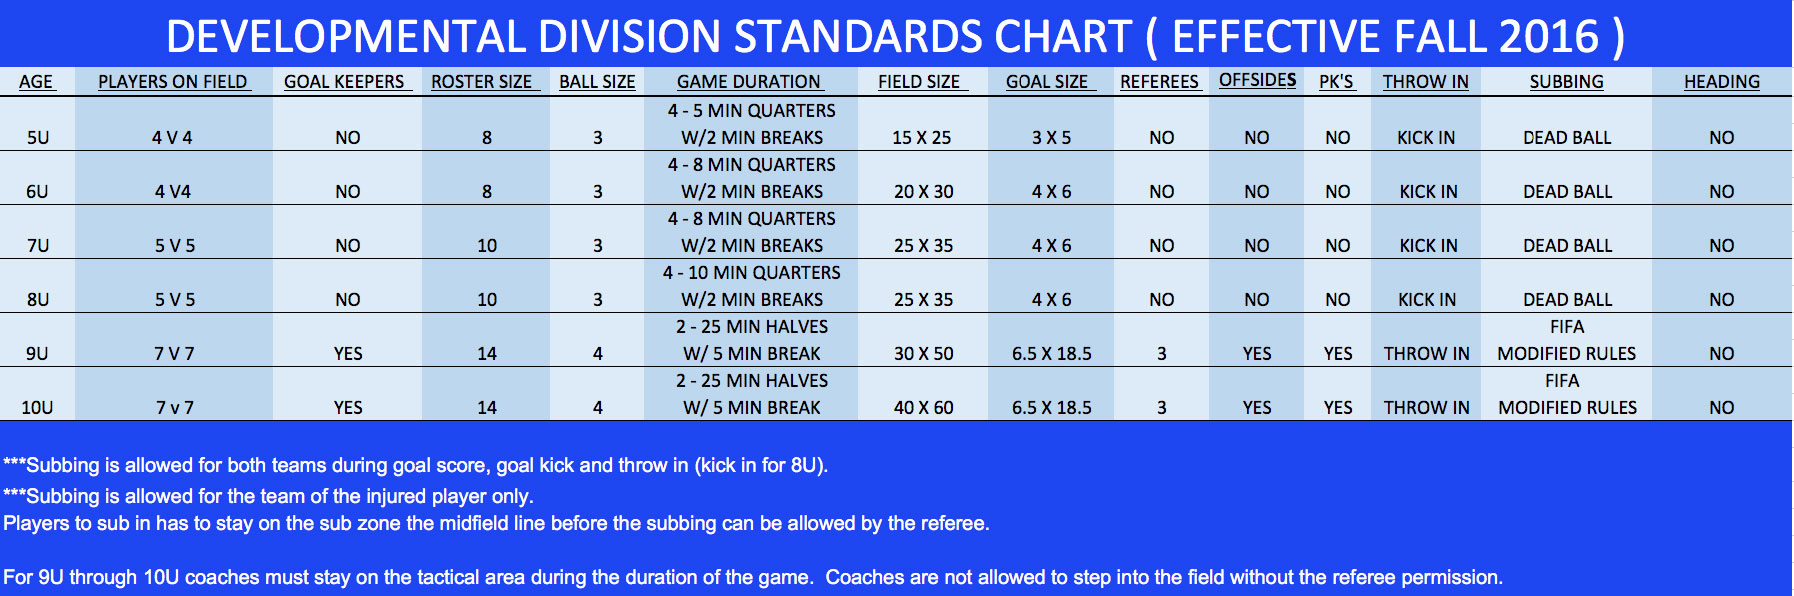 US Soccer Developments Division Standards